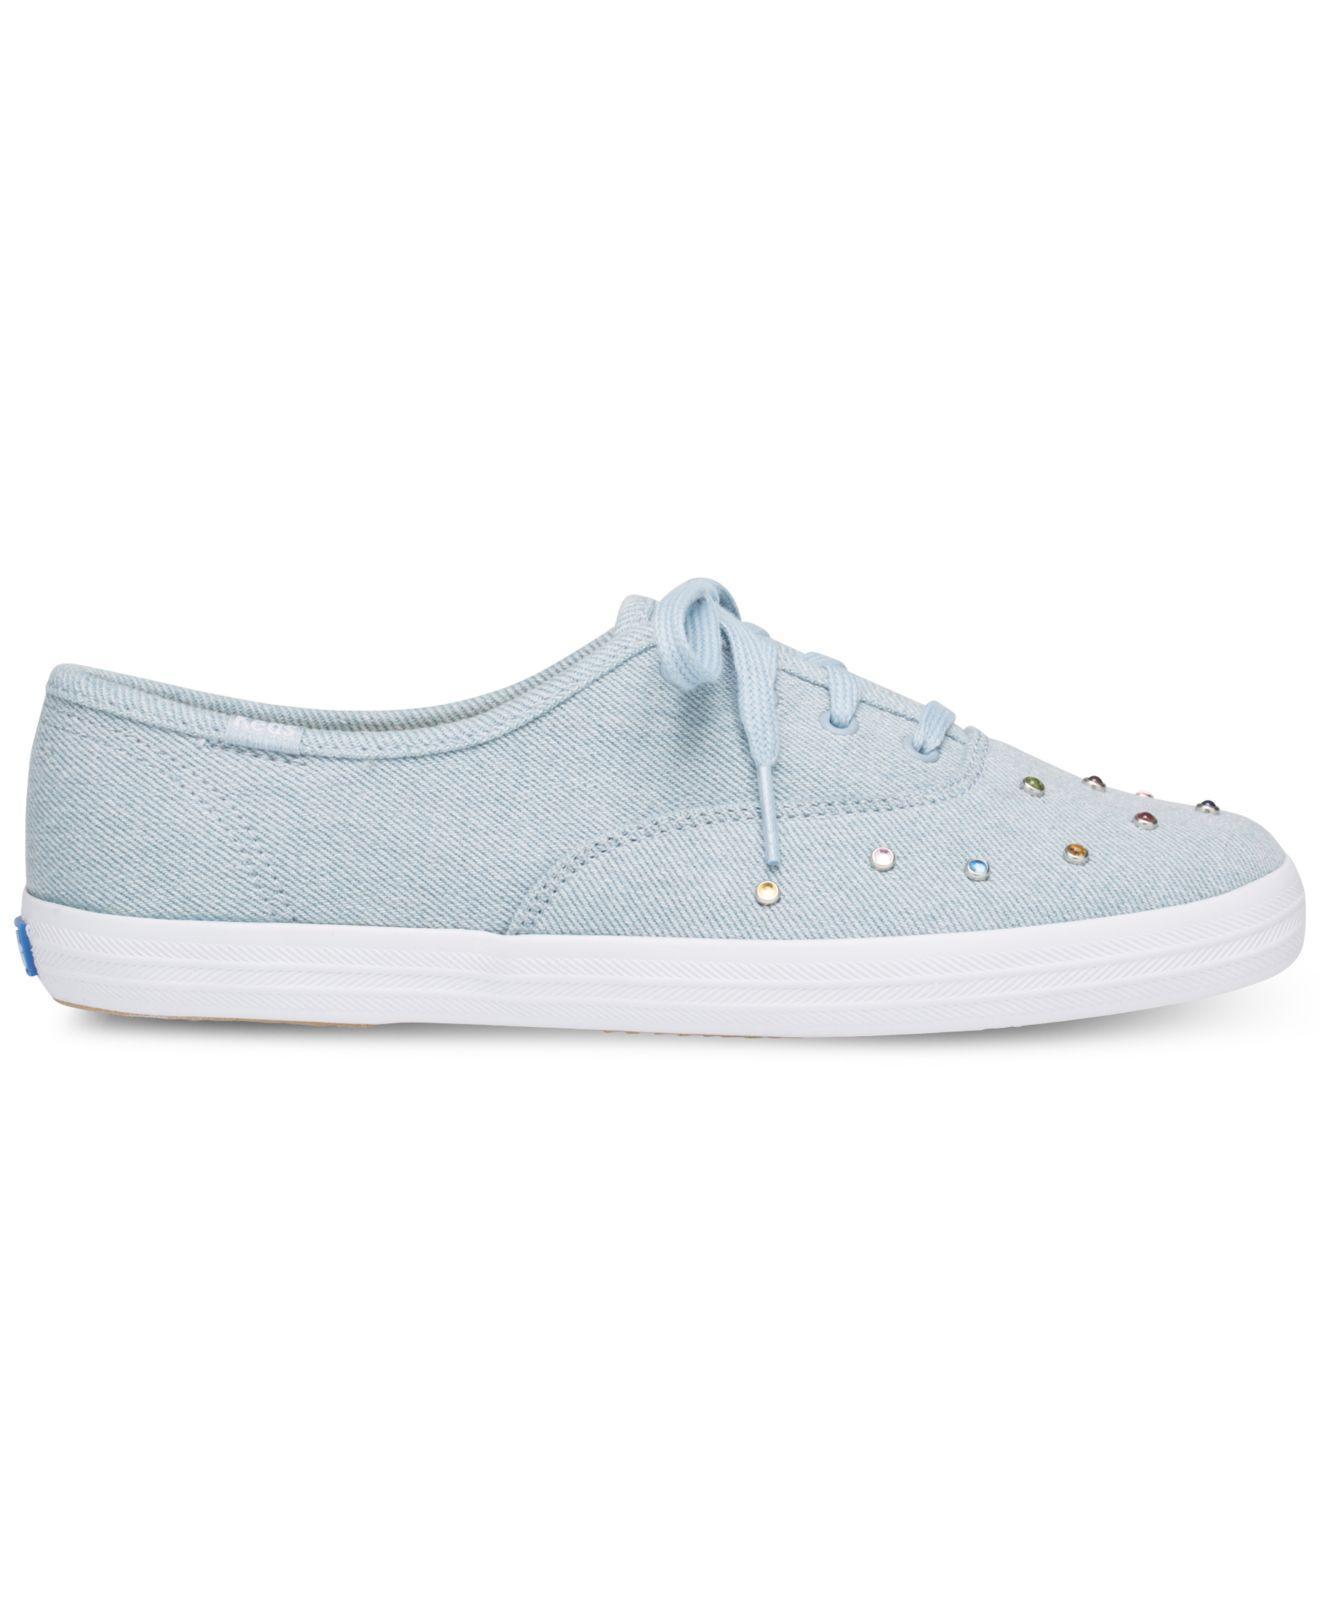 b9389949b3a Lyst - Keds Champion Starlight Stud Sneakers in Blue